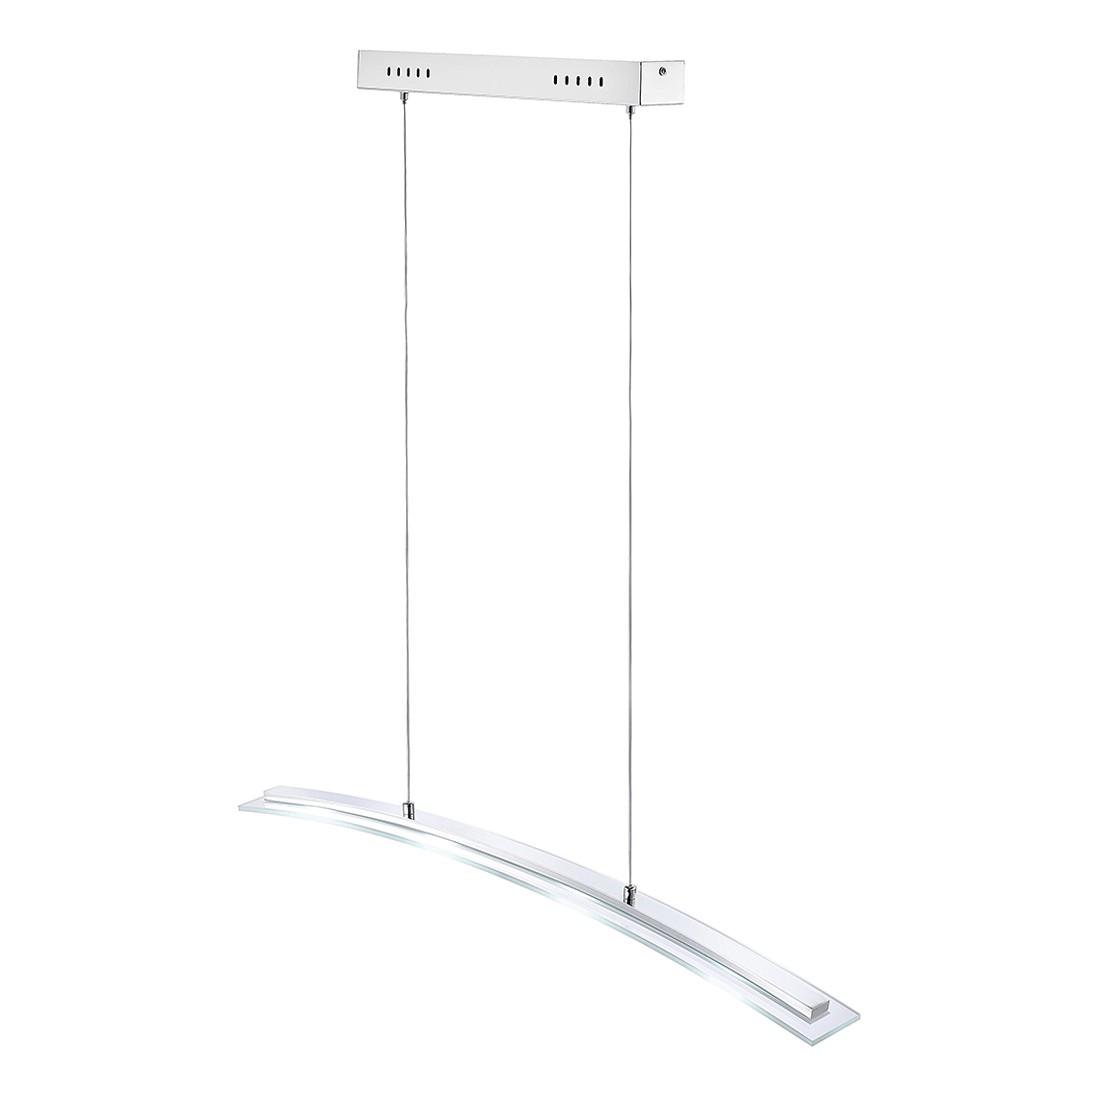 led pendelleuchte daniel by leuchten direkt eisen silber leuchten direkt a g nstig. Black Bedroom Furniture Sets. Home Design Ideas